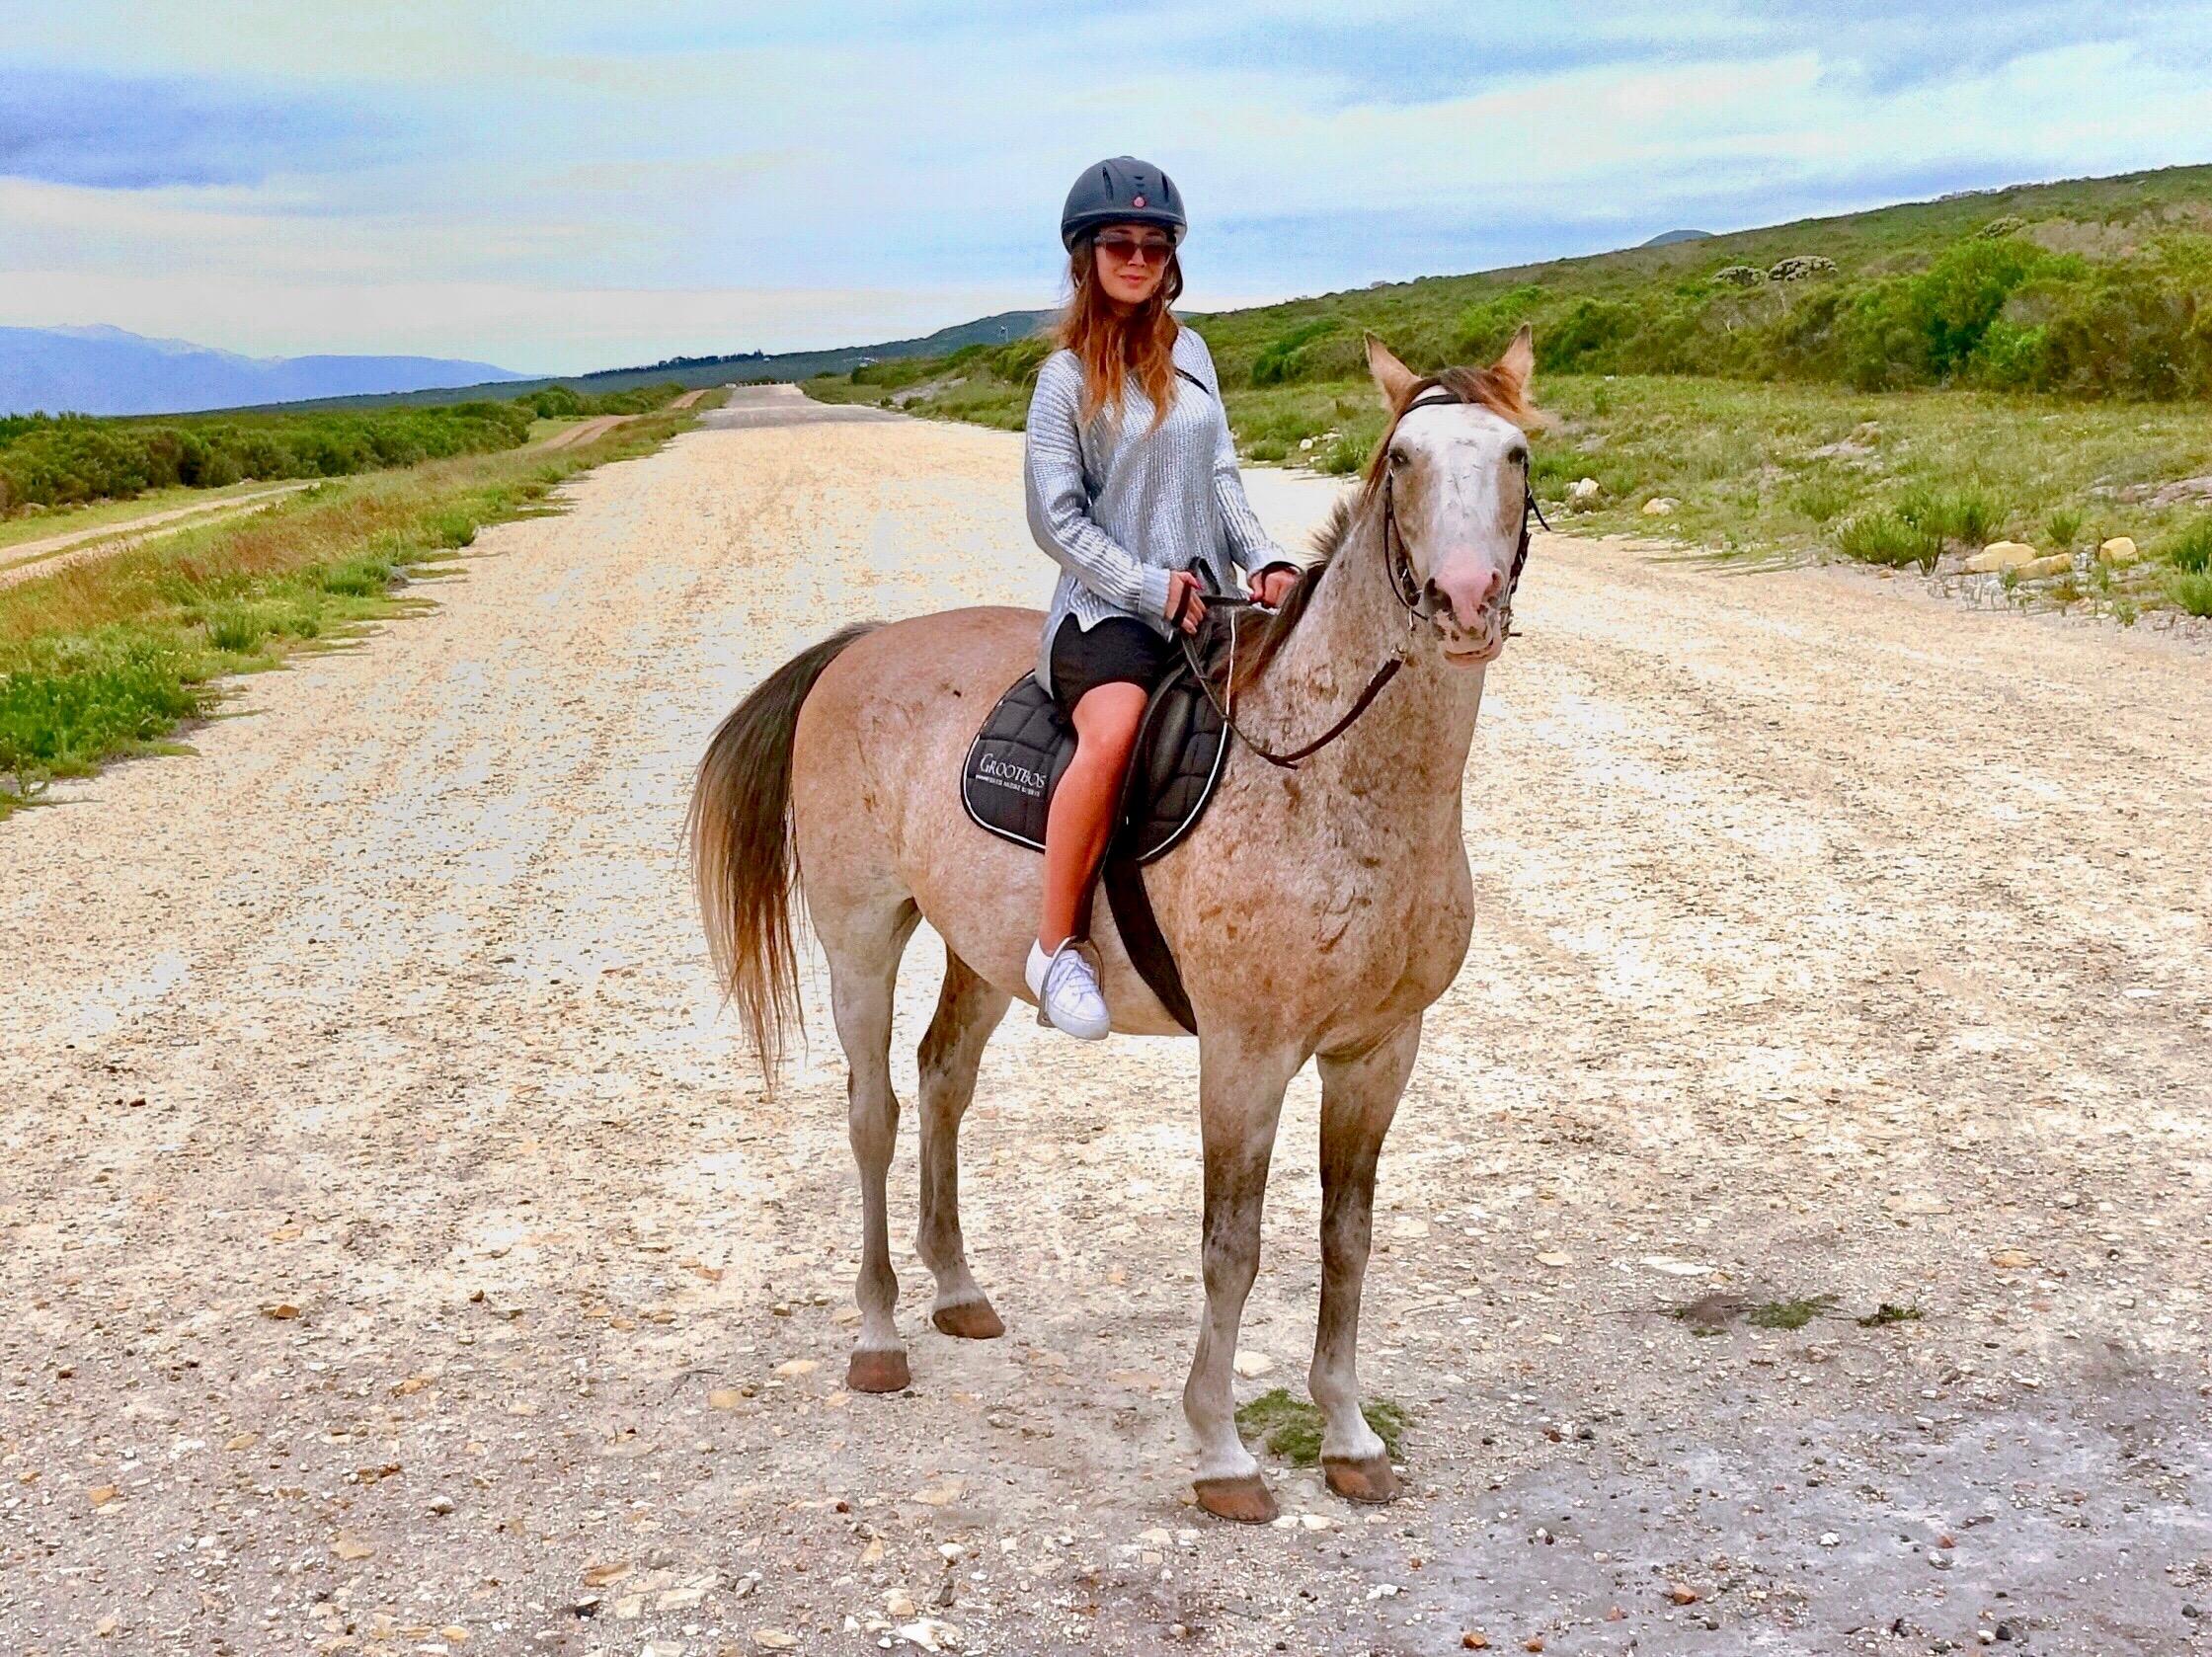 grootbos-horseback-riding-southafrica-lustforthesublime